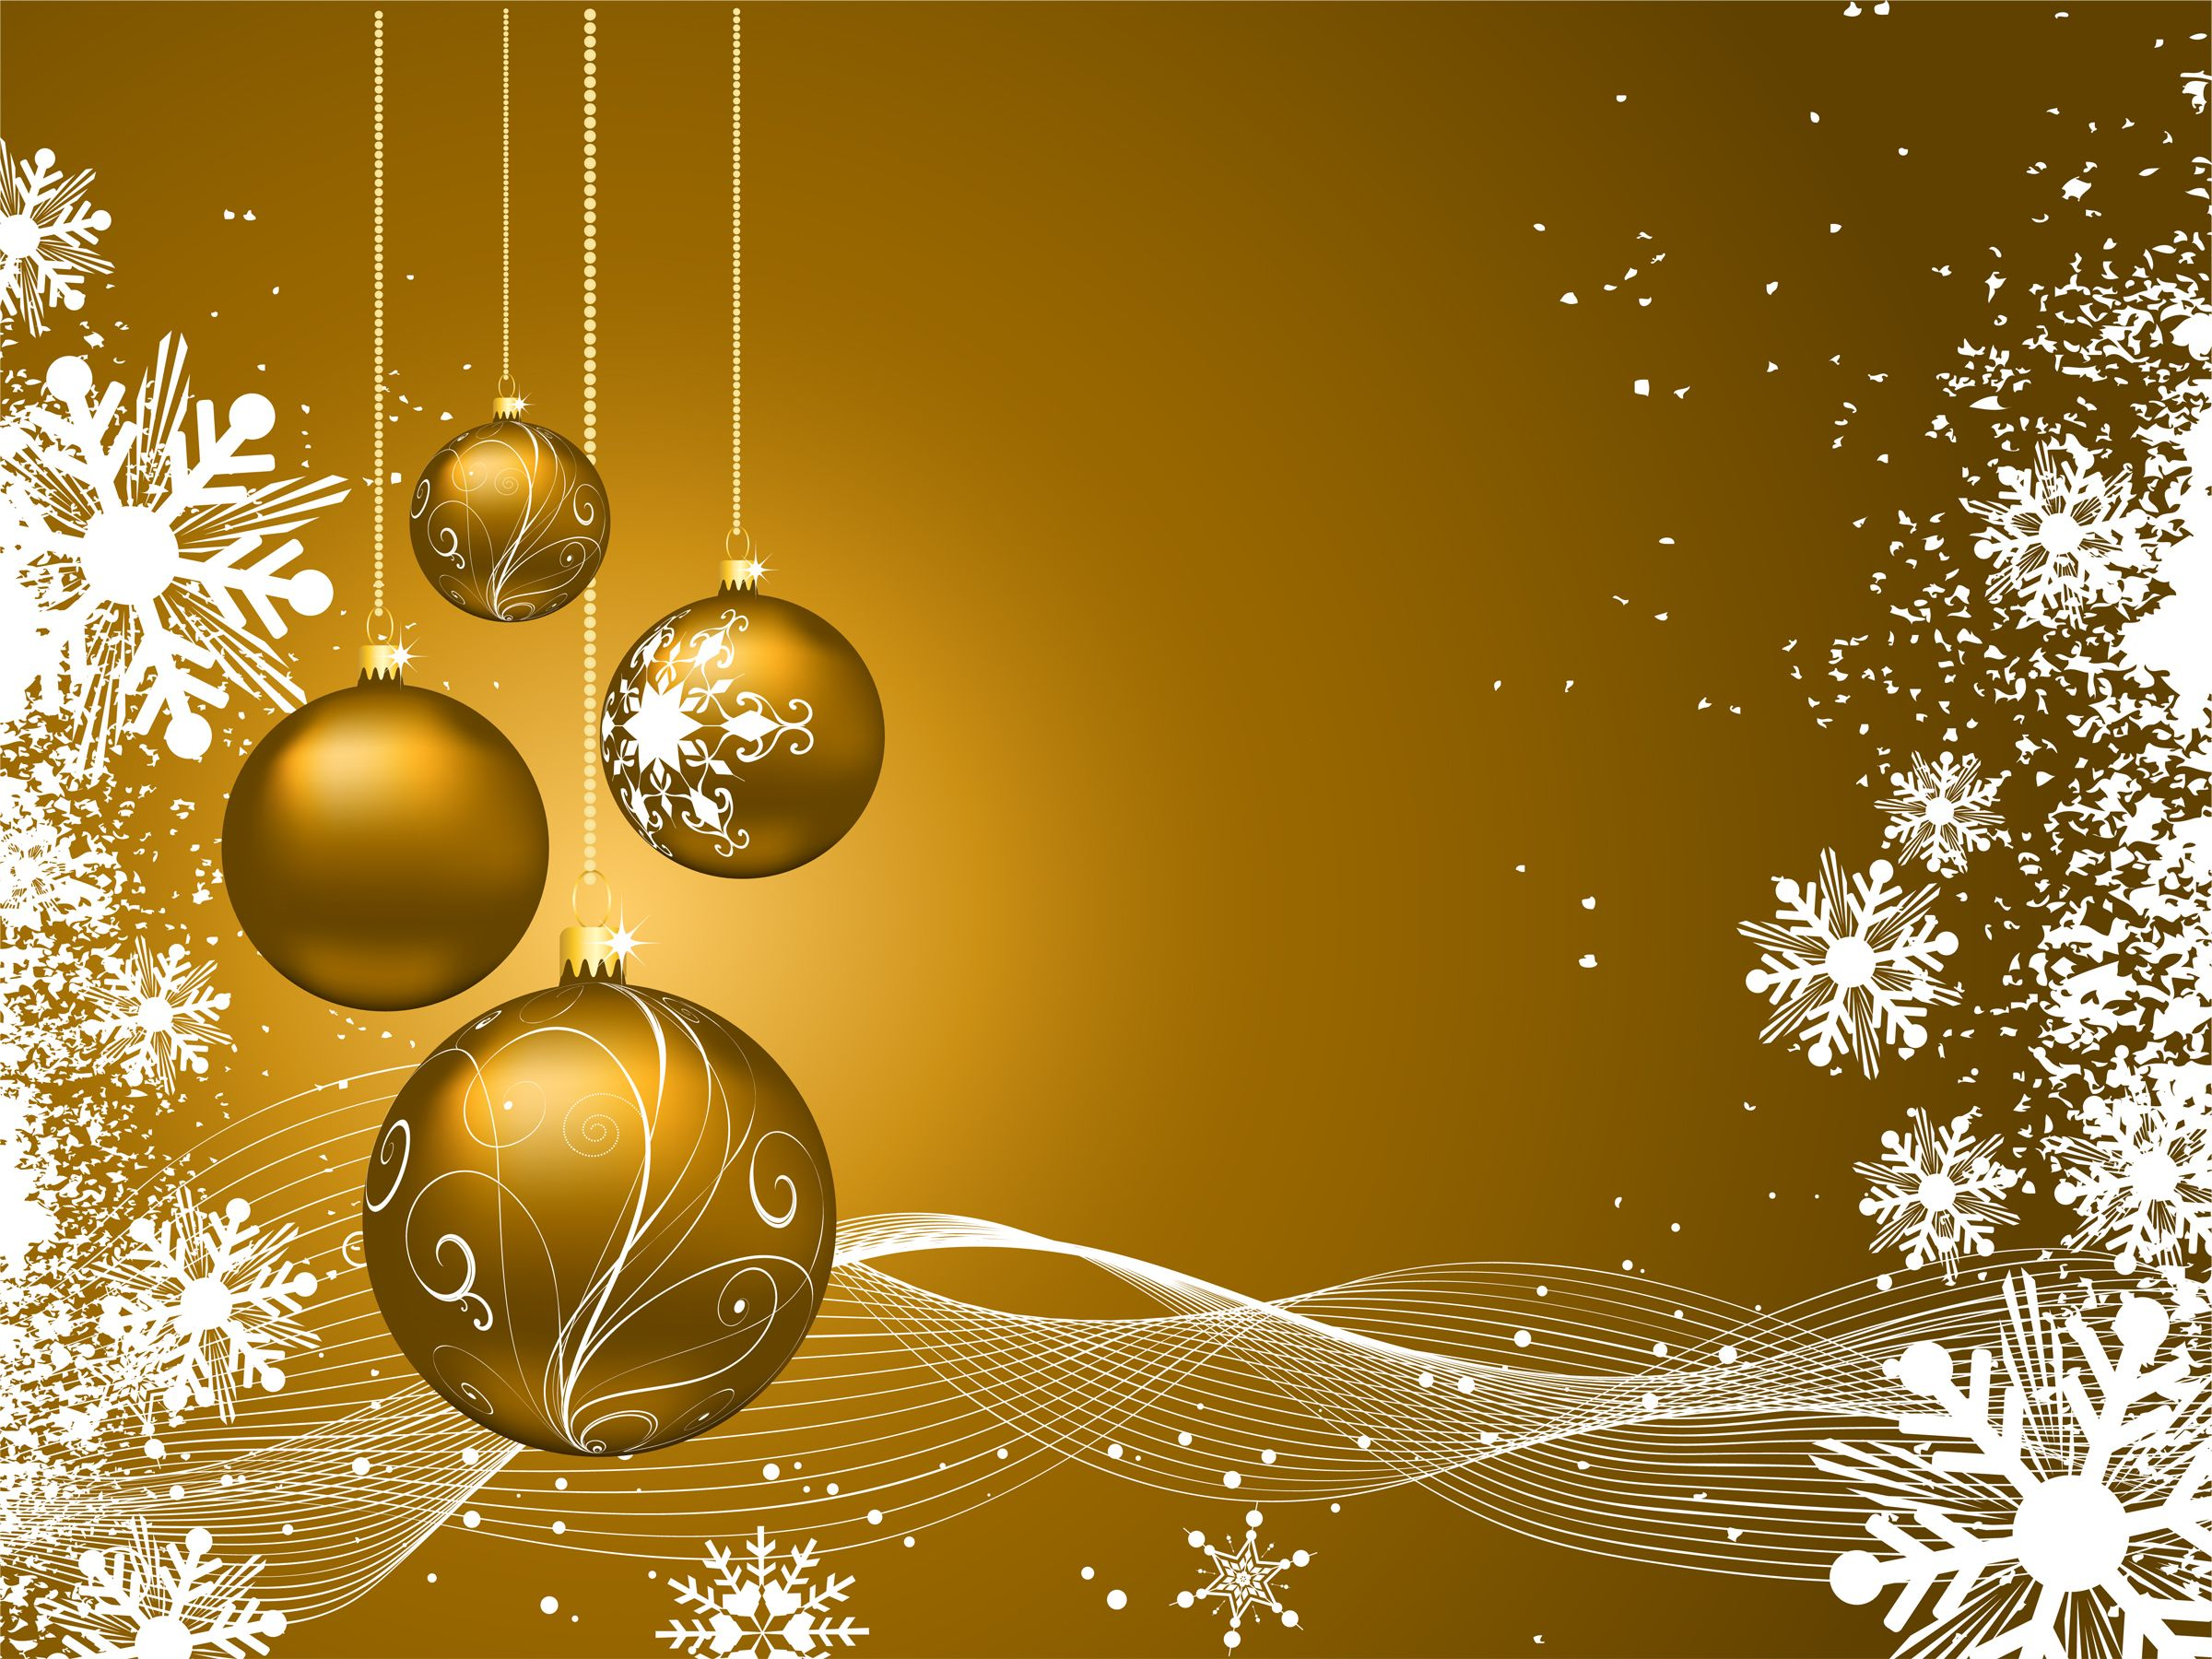 Pin On Christmas And Valintines Feliz natal wallpaper hd